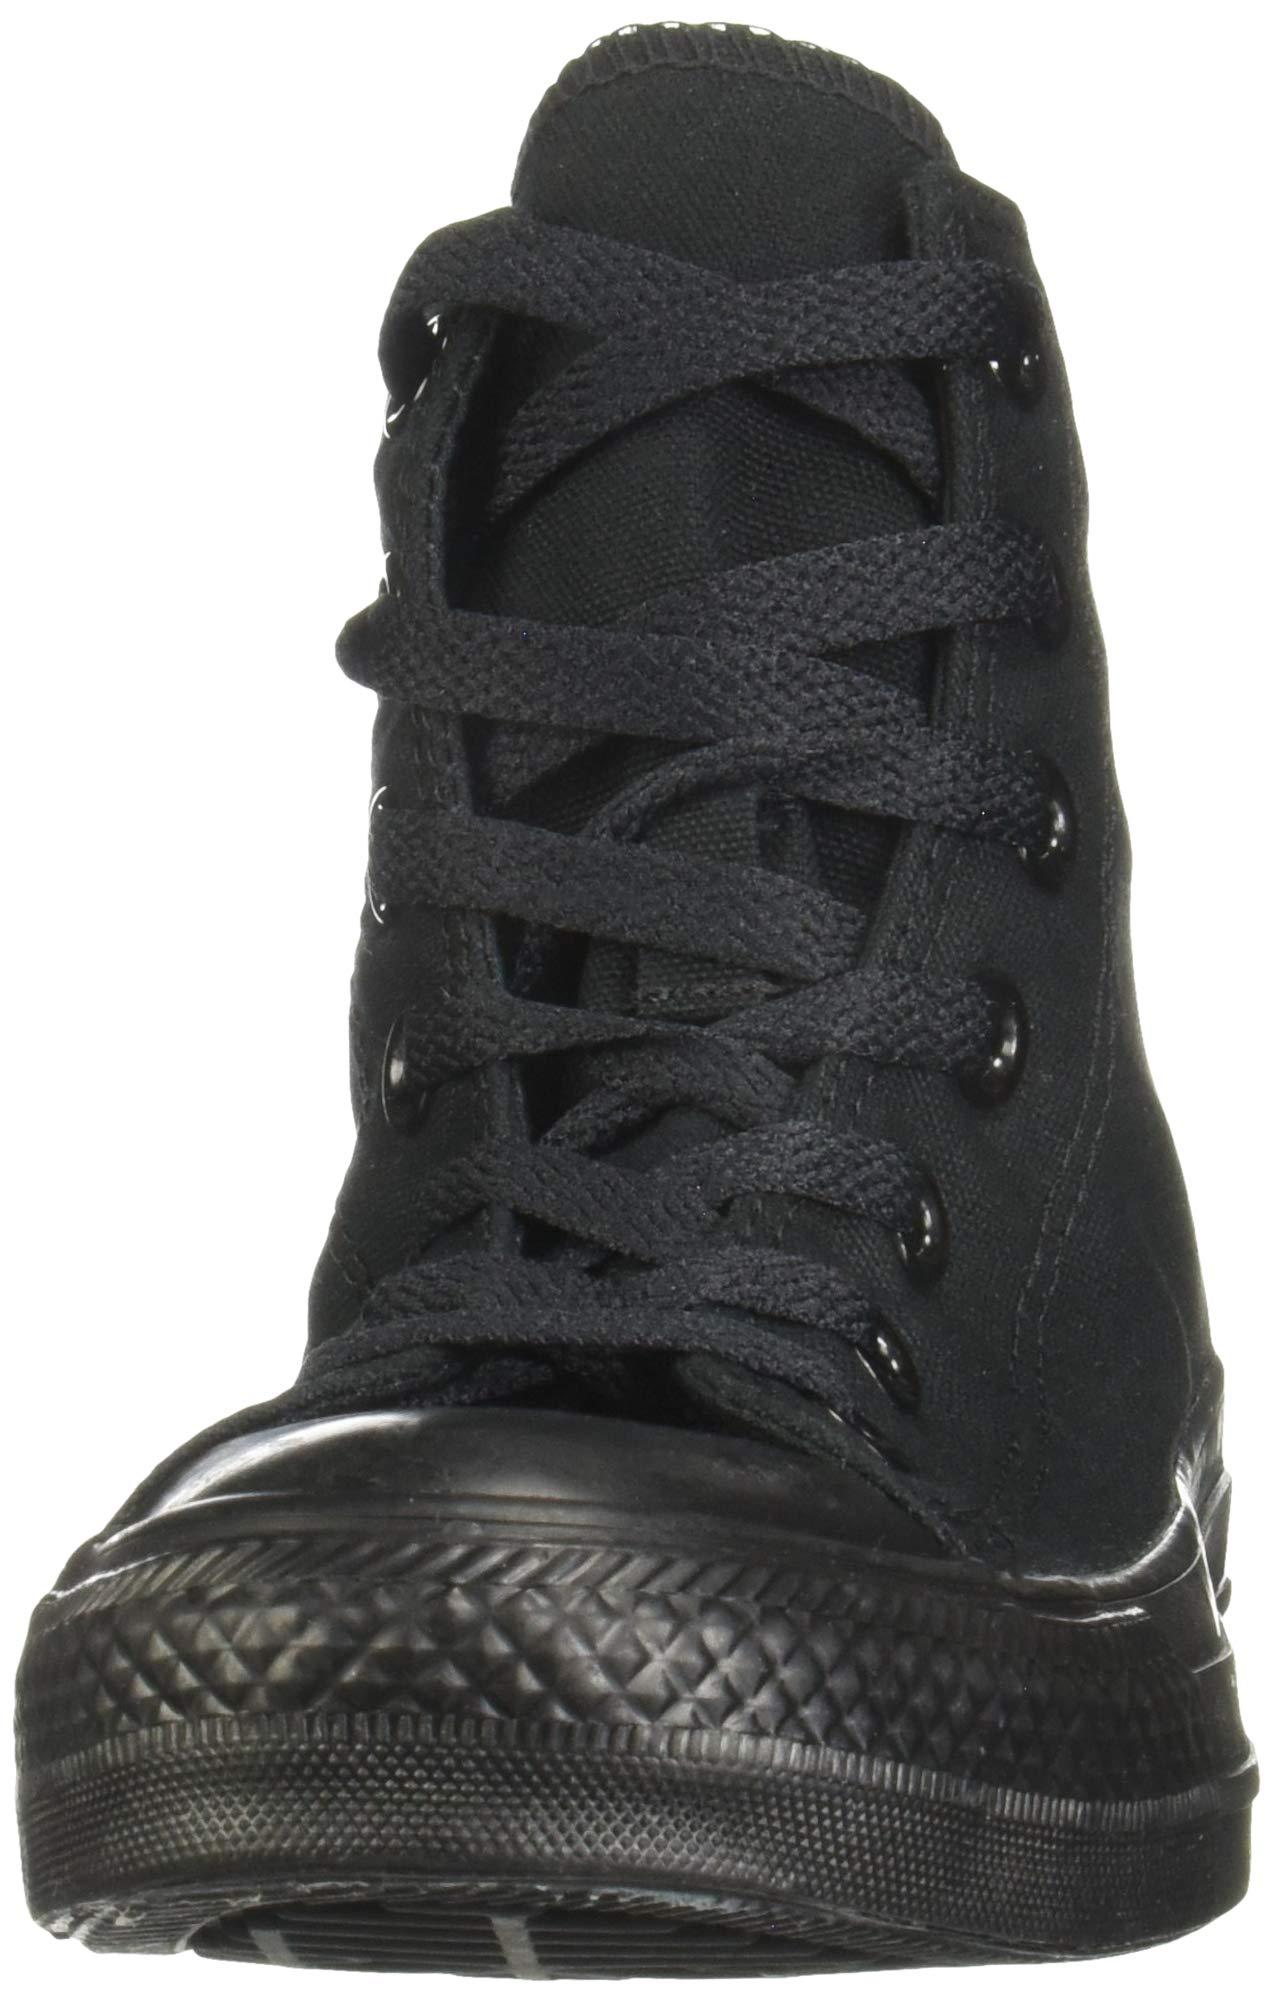 Converse BLAC KMONO-M3310-HI-TOP by Converse (Image #4)